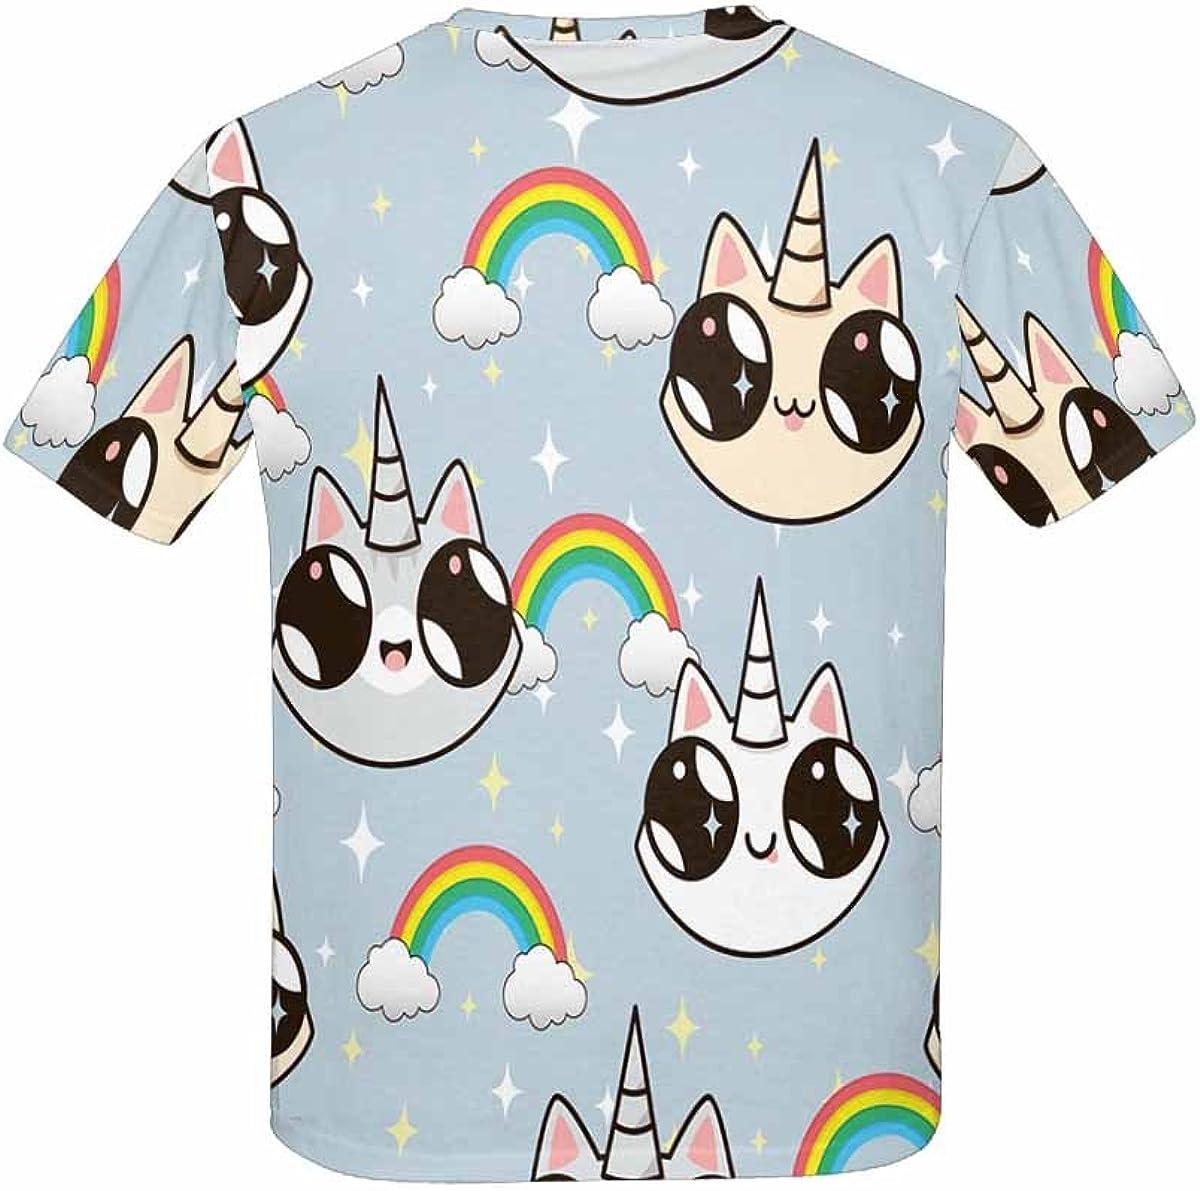 INTERESTPRINT Kids T-Shirt Cats Unicorns and A Rainbow XS-XL